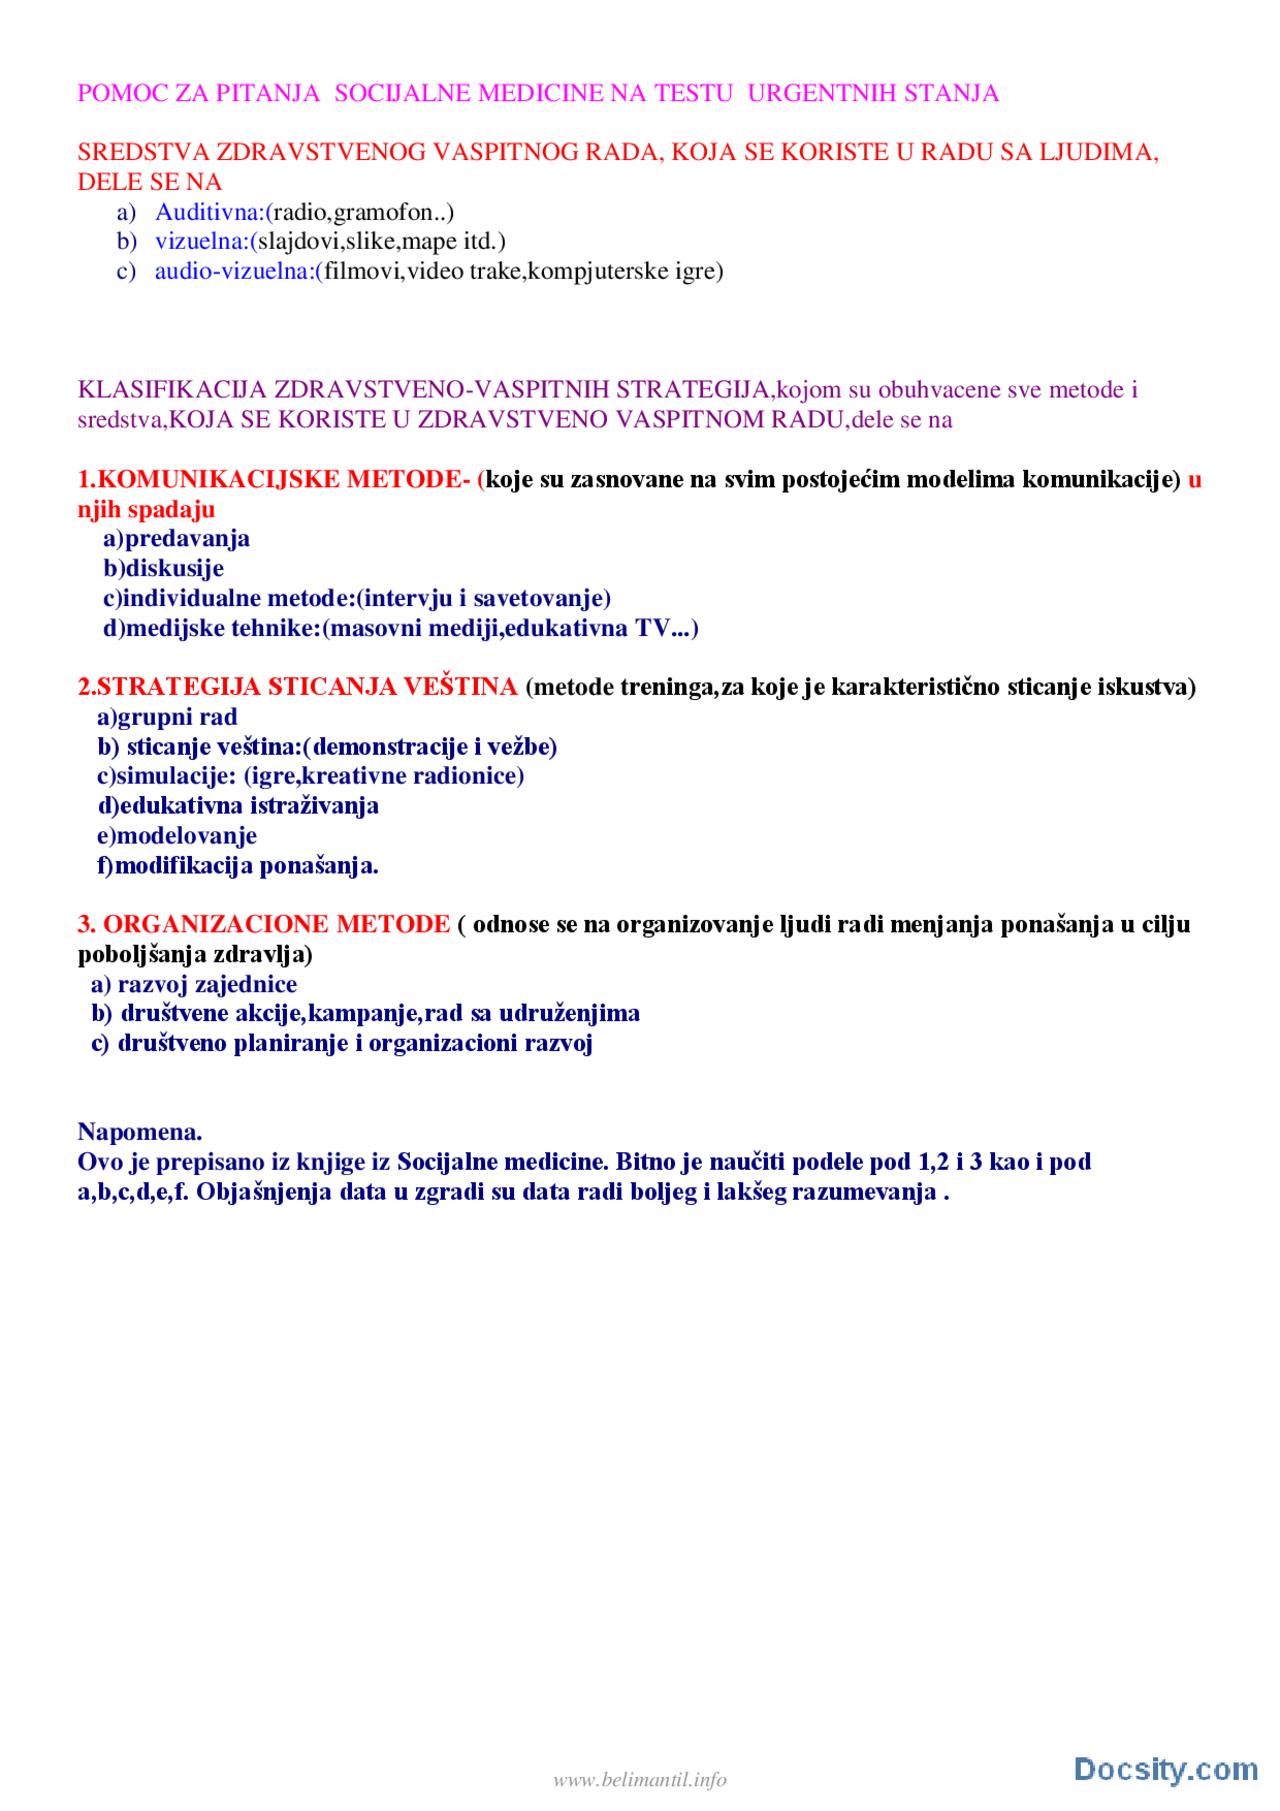 Ispitna Pitanja Urgentna Stanja Ispit Socijalna Medicina Medicina Ispiti Predlog Prva Pomoc Docsity